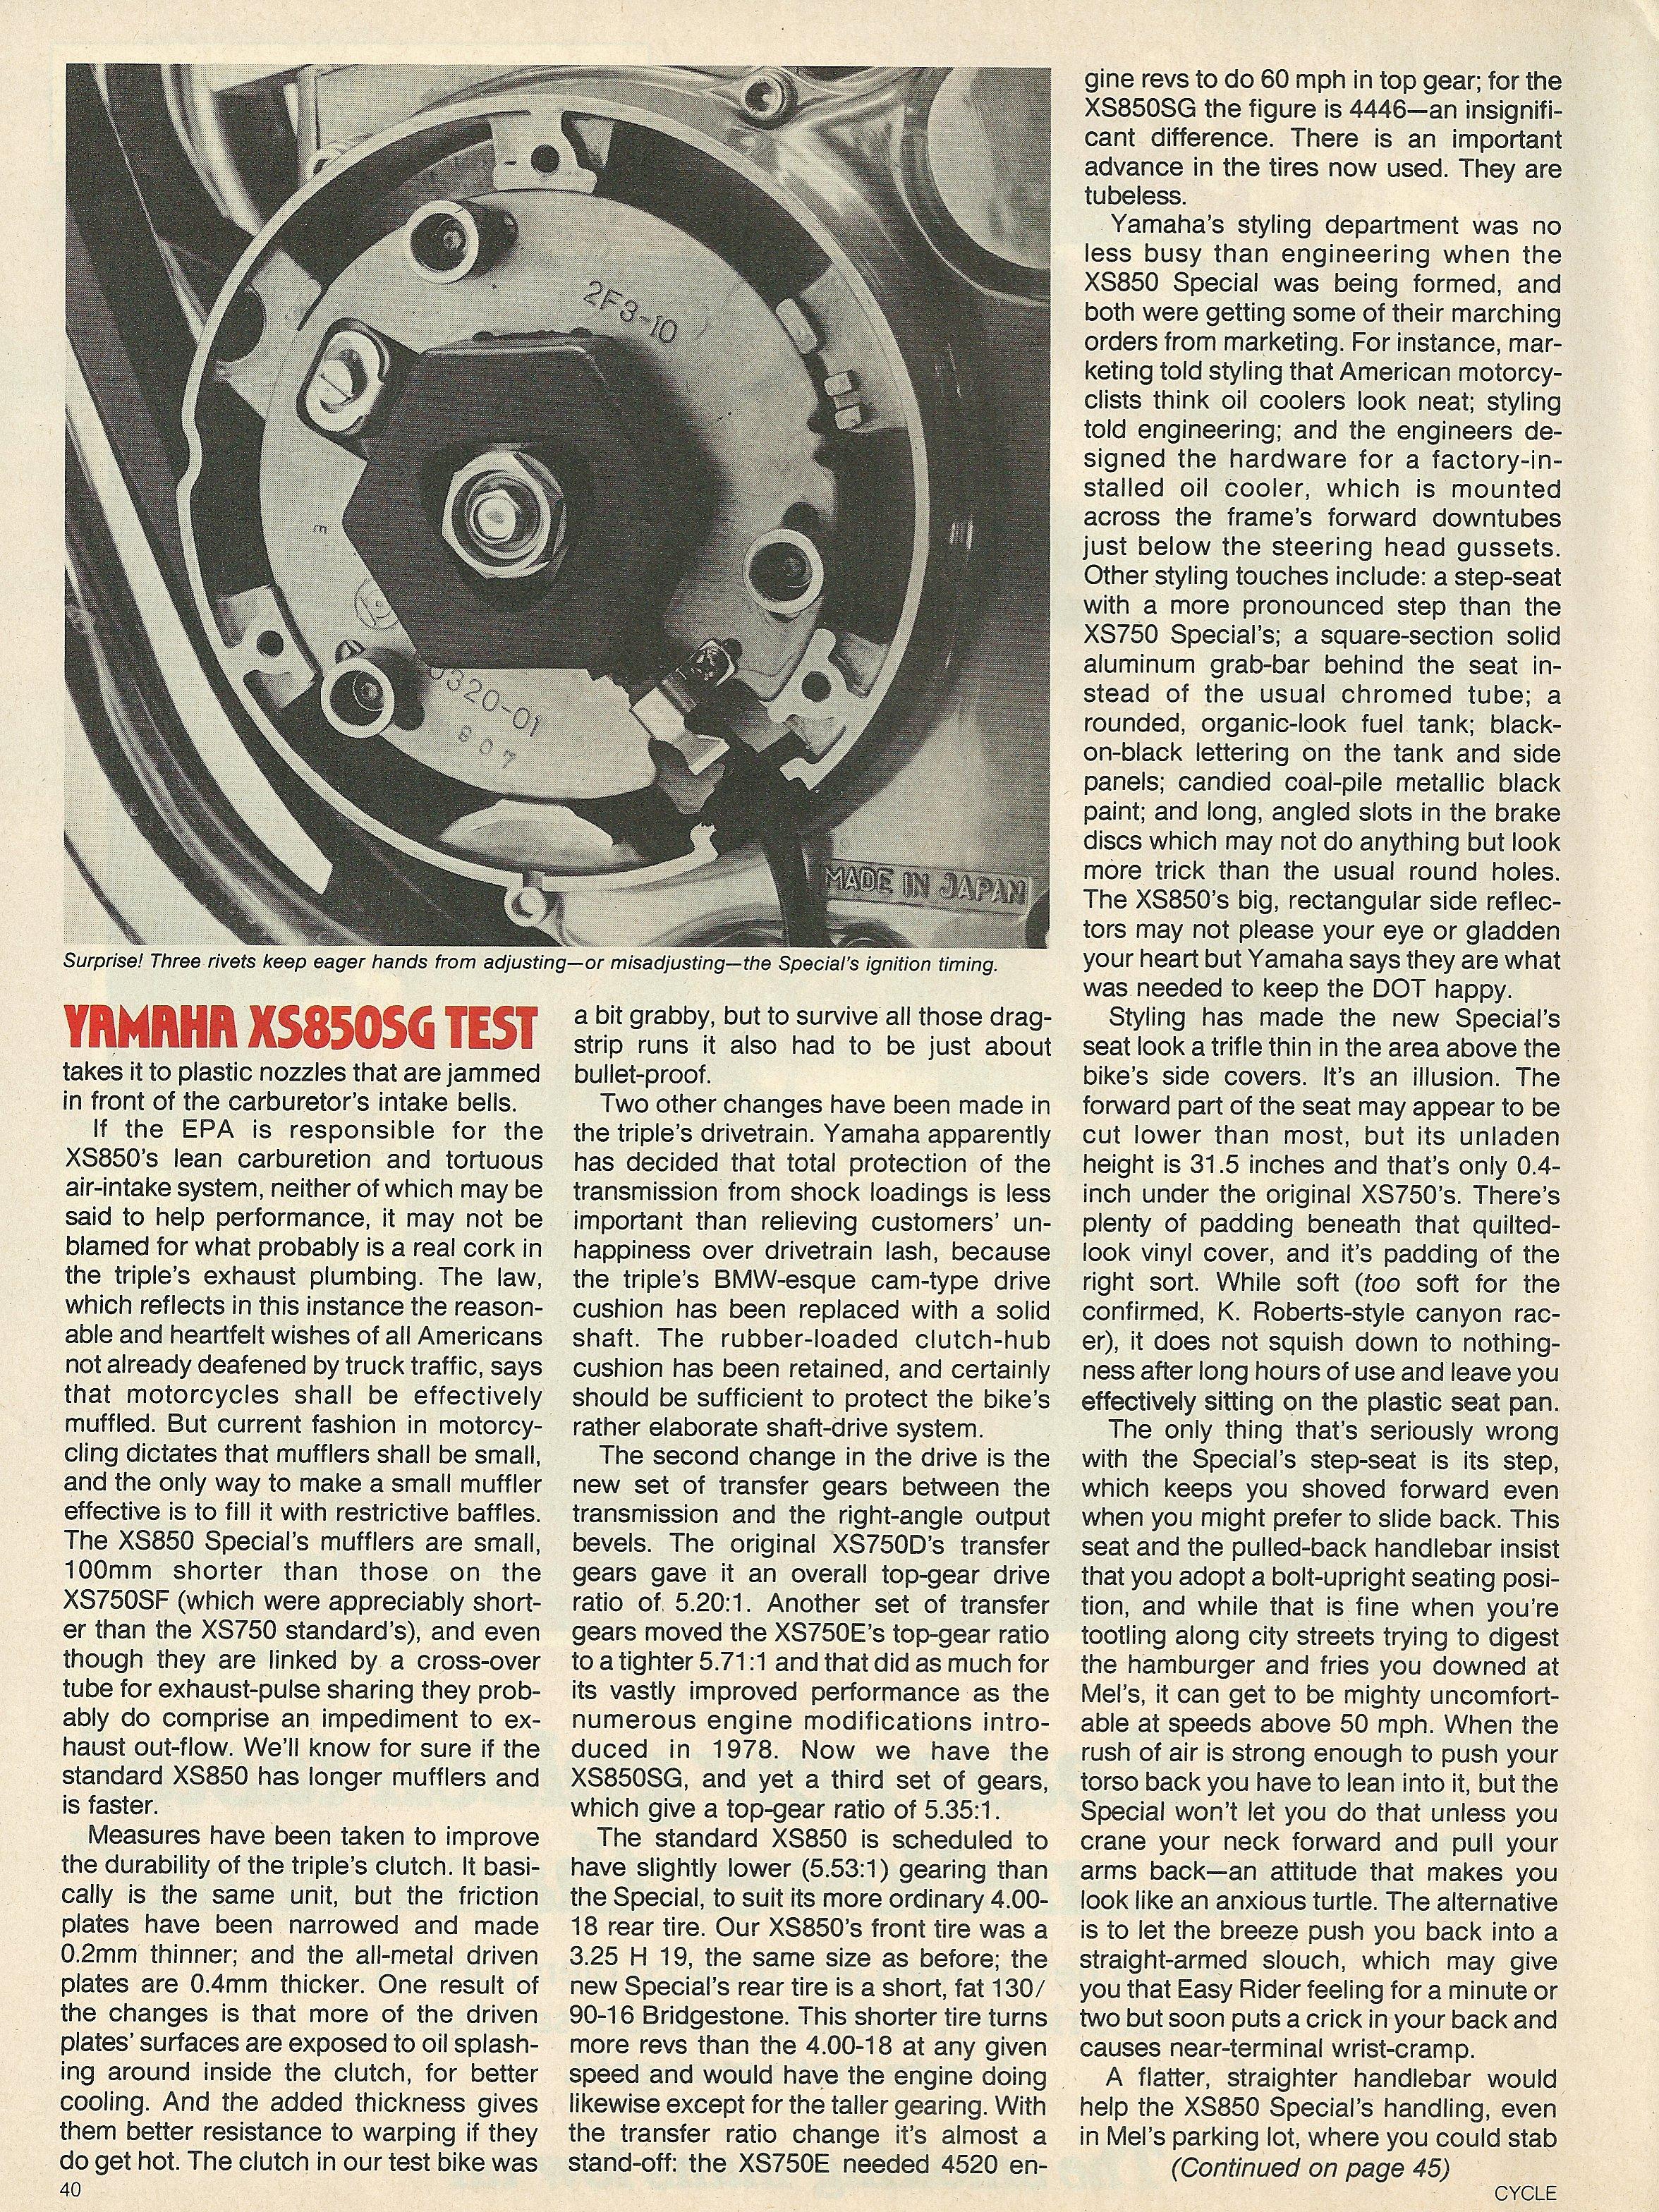 1980 Yamaha XS850SG road test 6.JPG